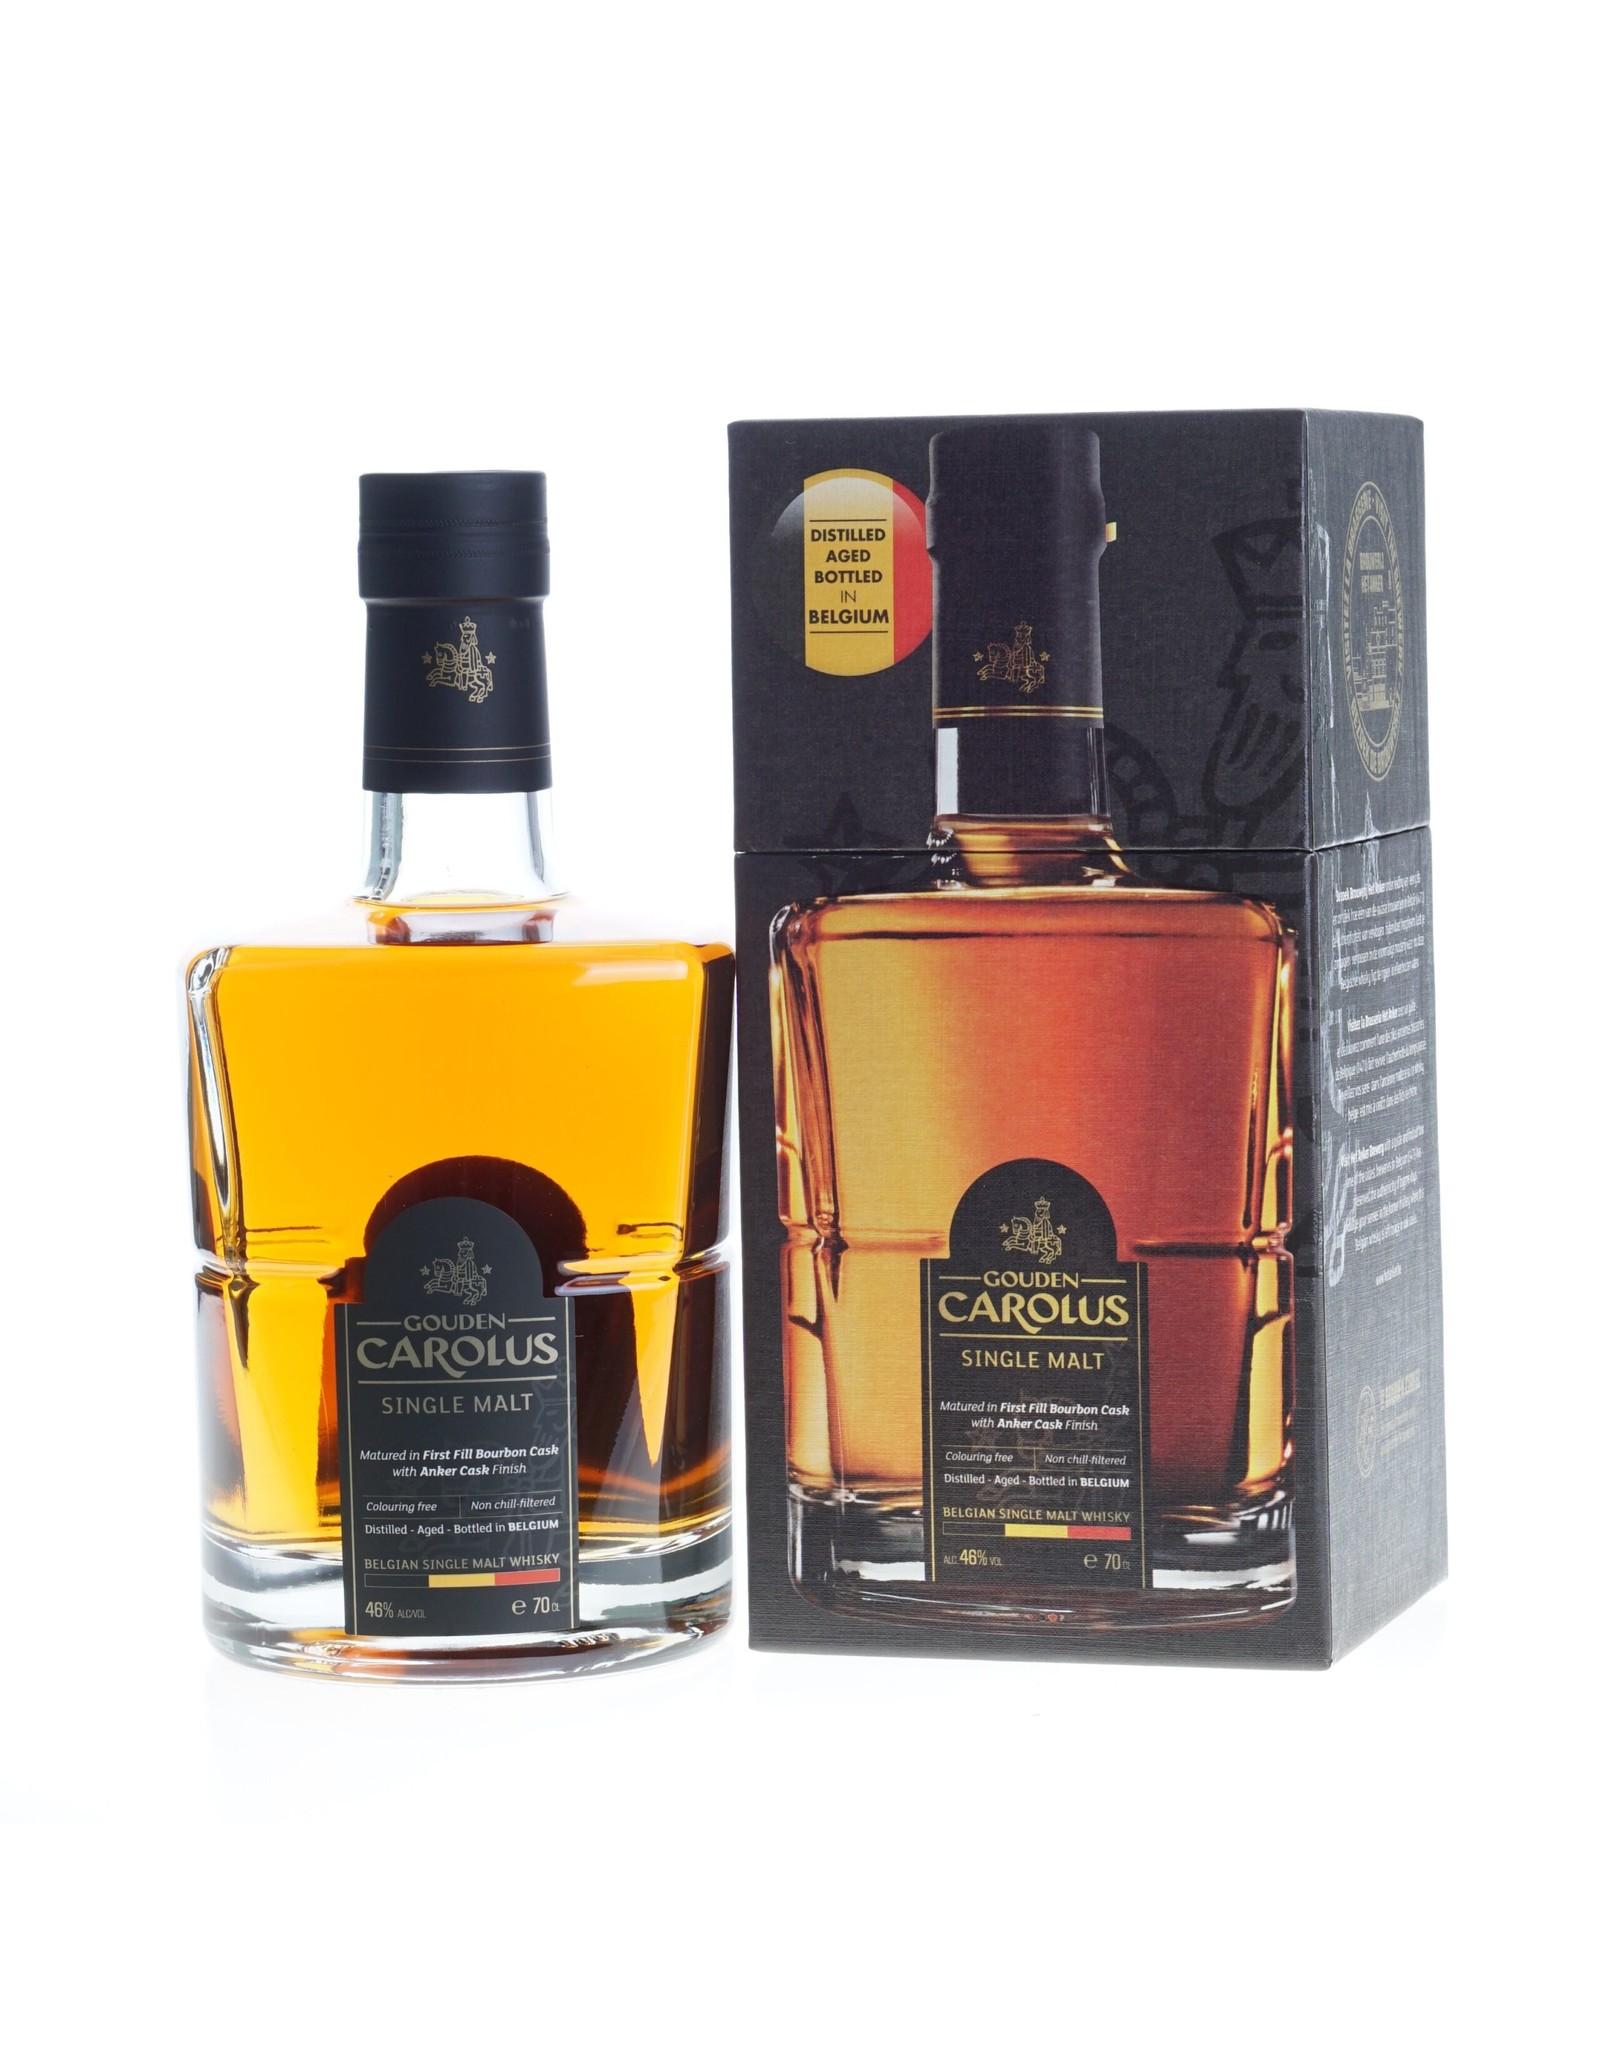 Gouden Carolus Gouden Carolus Single Malt Bourbon Cask with Anker Cask Finish 70cl